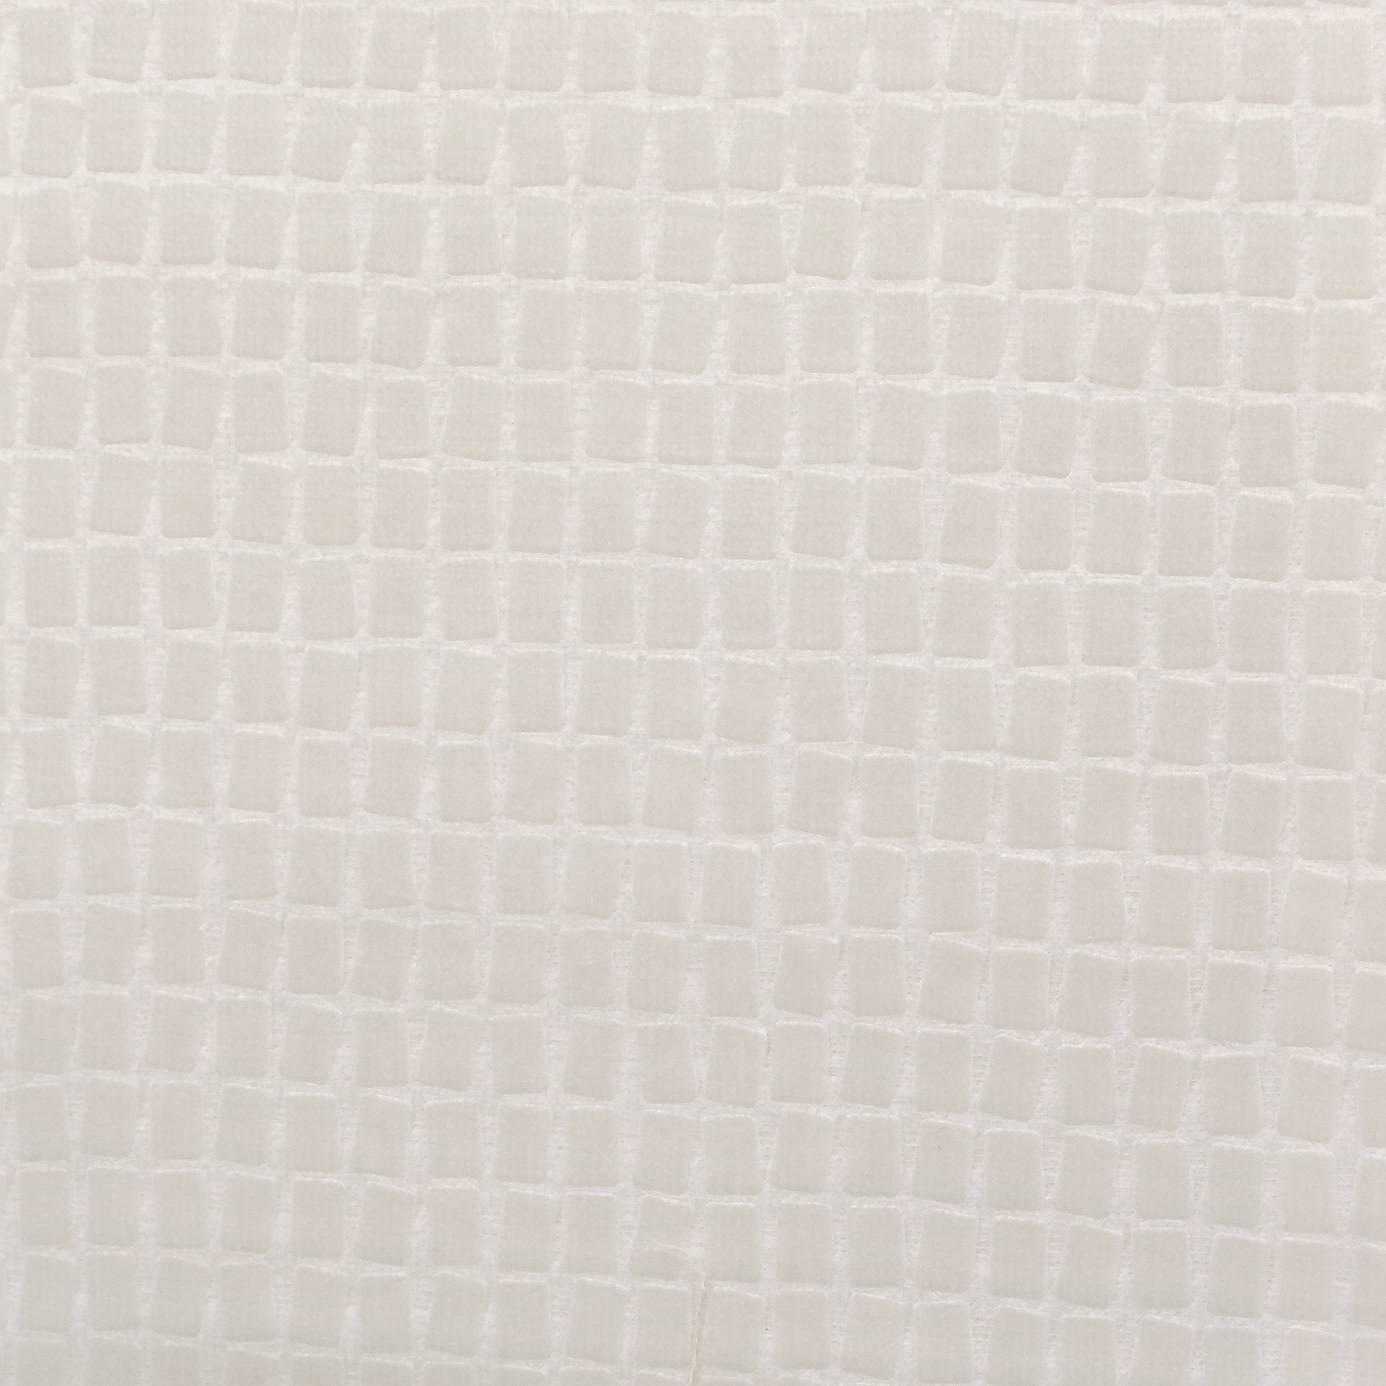 petit rectangle fabric blanc 27830109 casadeco place. Black Bedroom Furniture Sets. Home Design Ideas